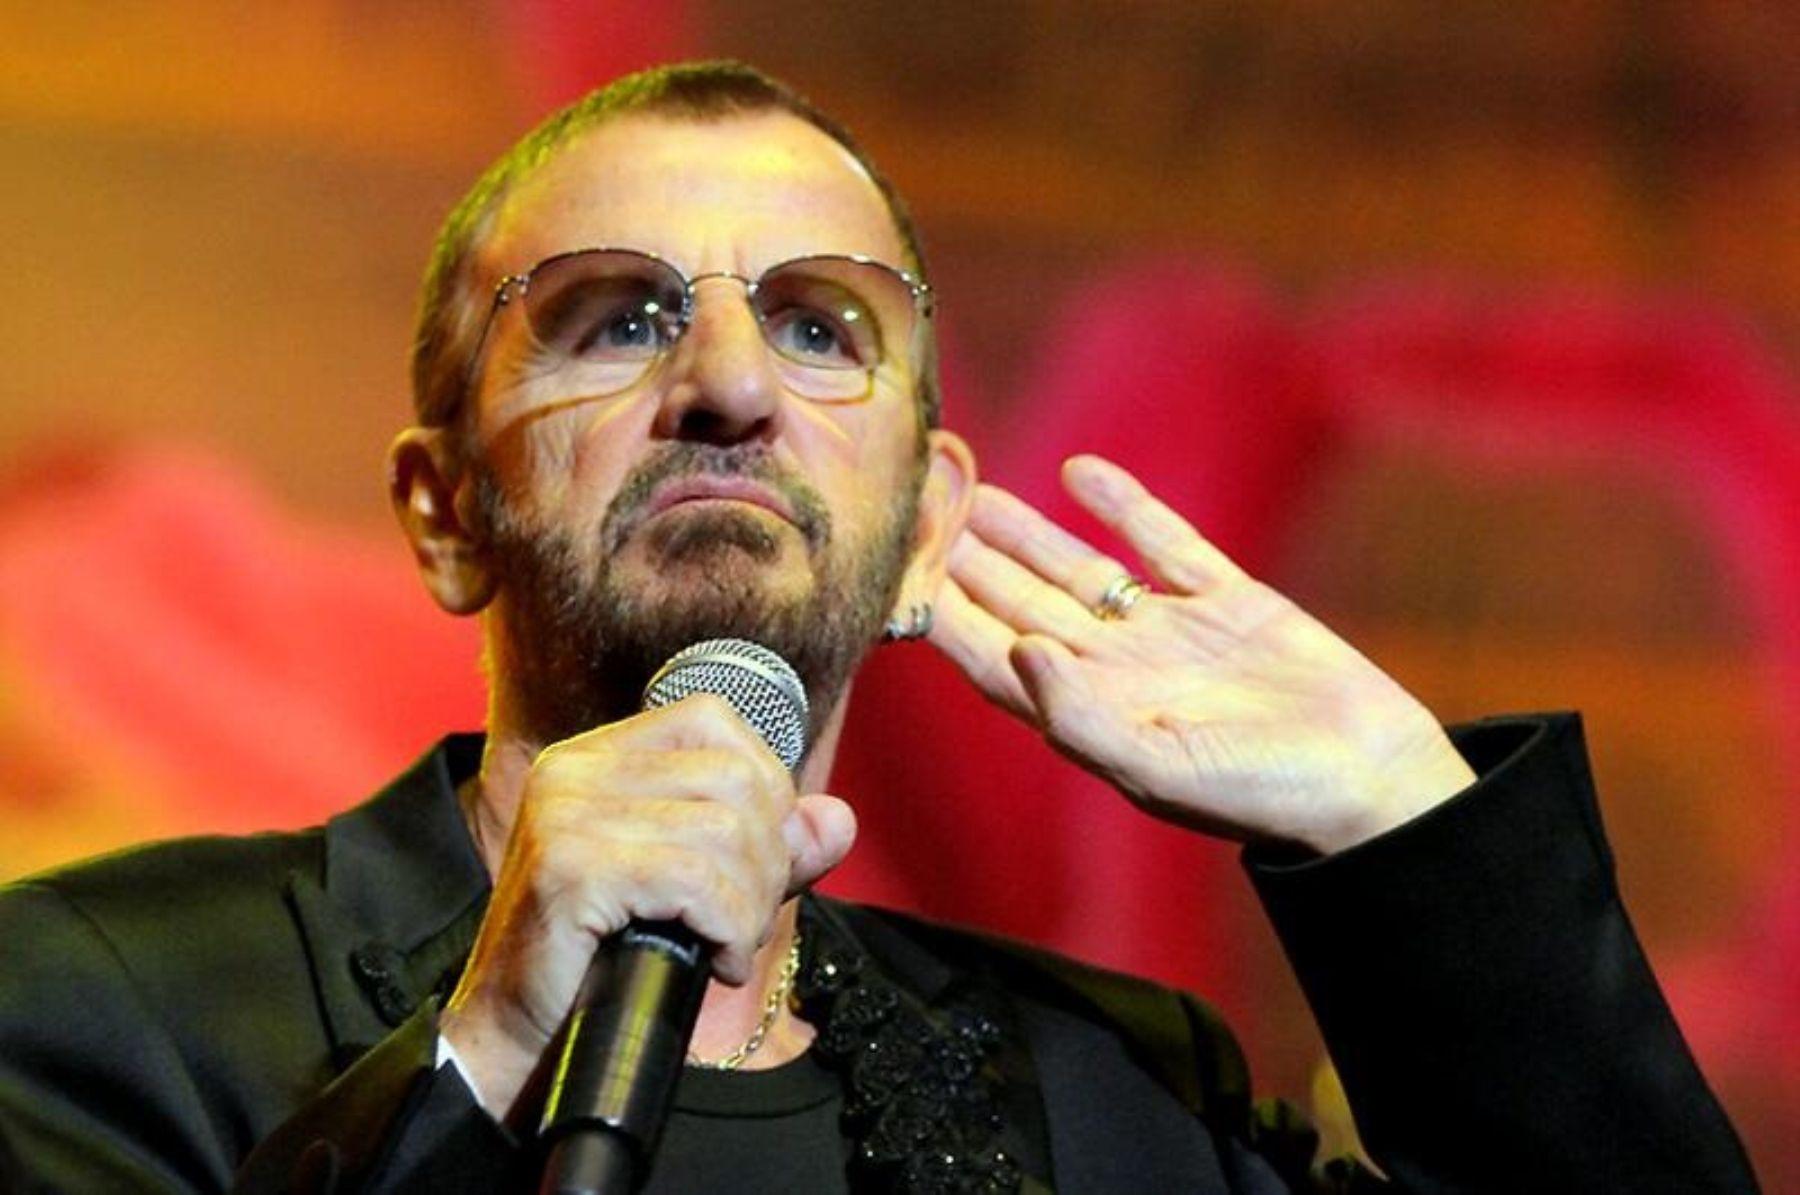 Ringo Starr amazes his Peruvian fans at Lima